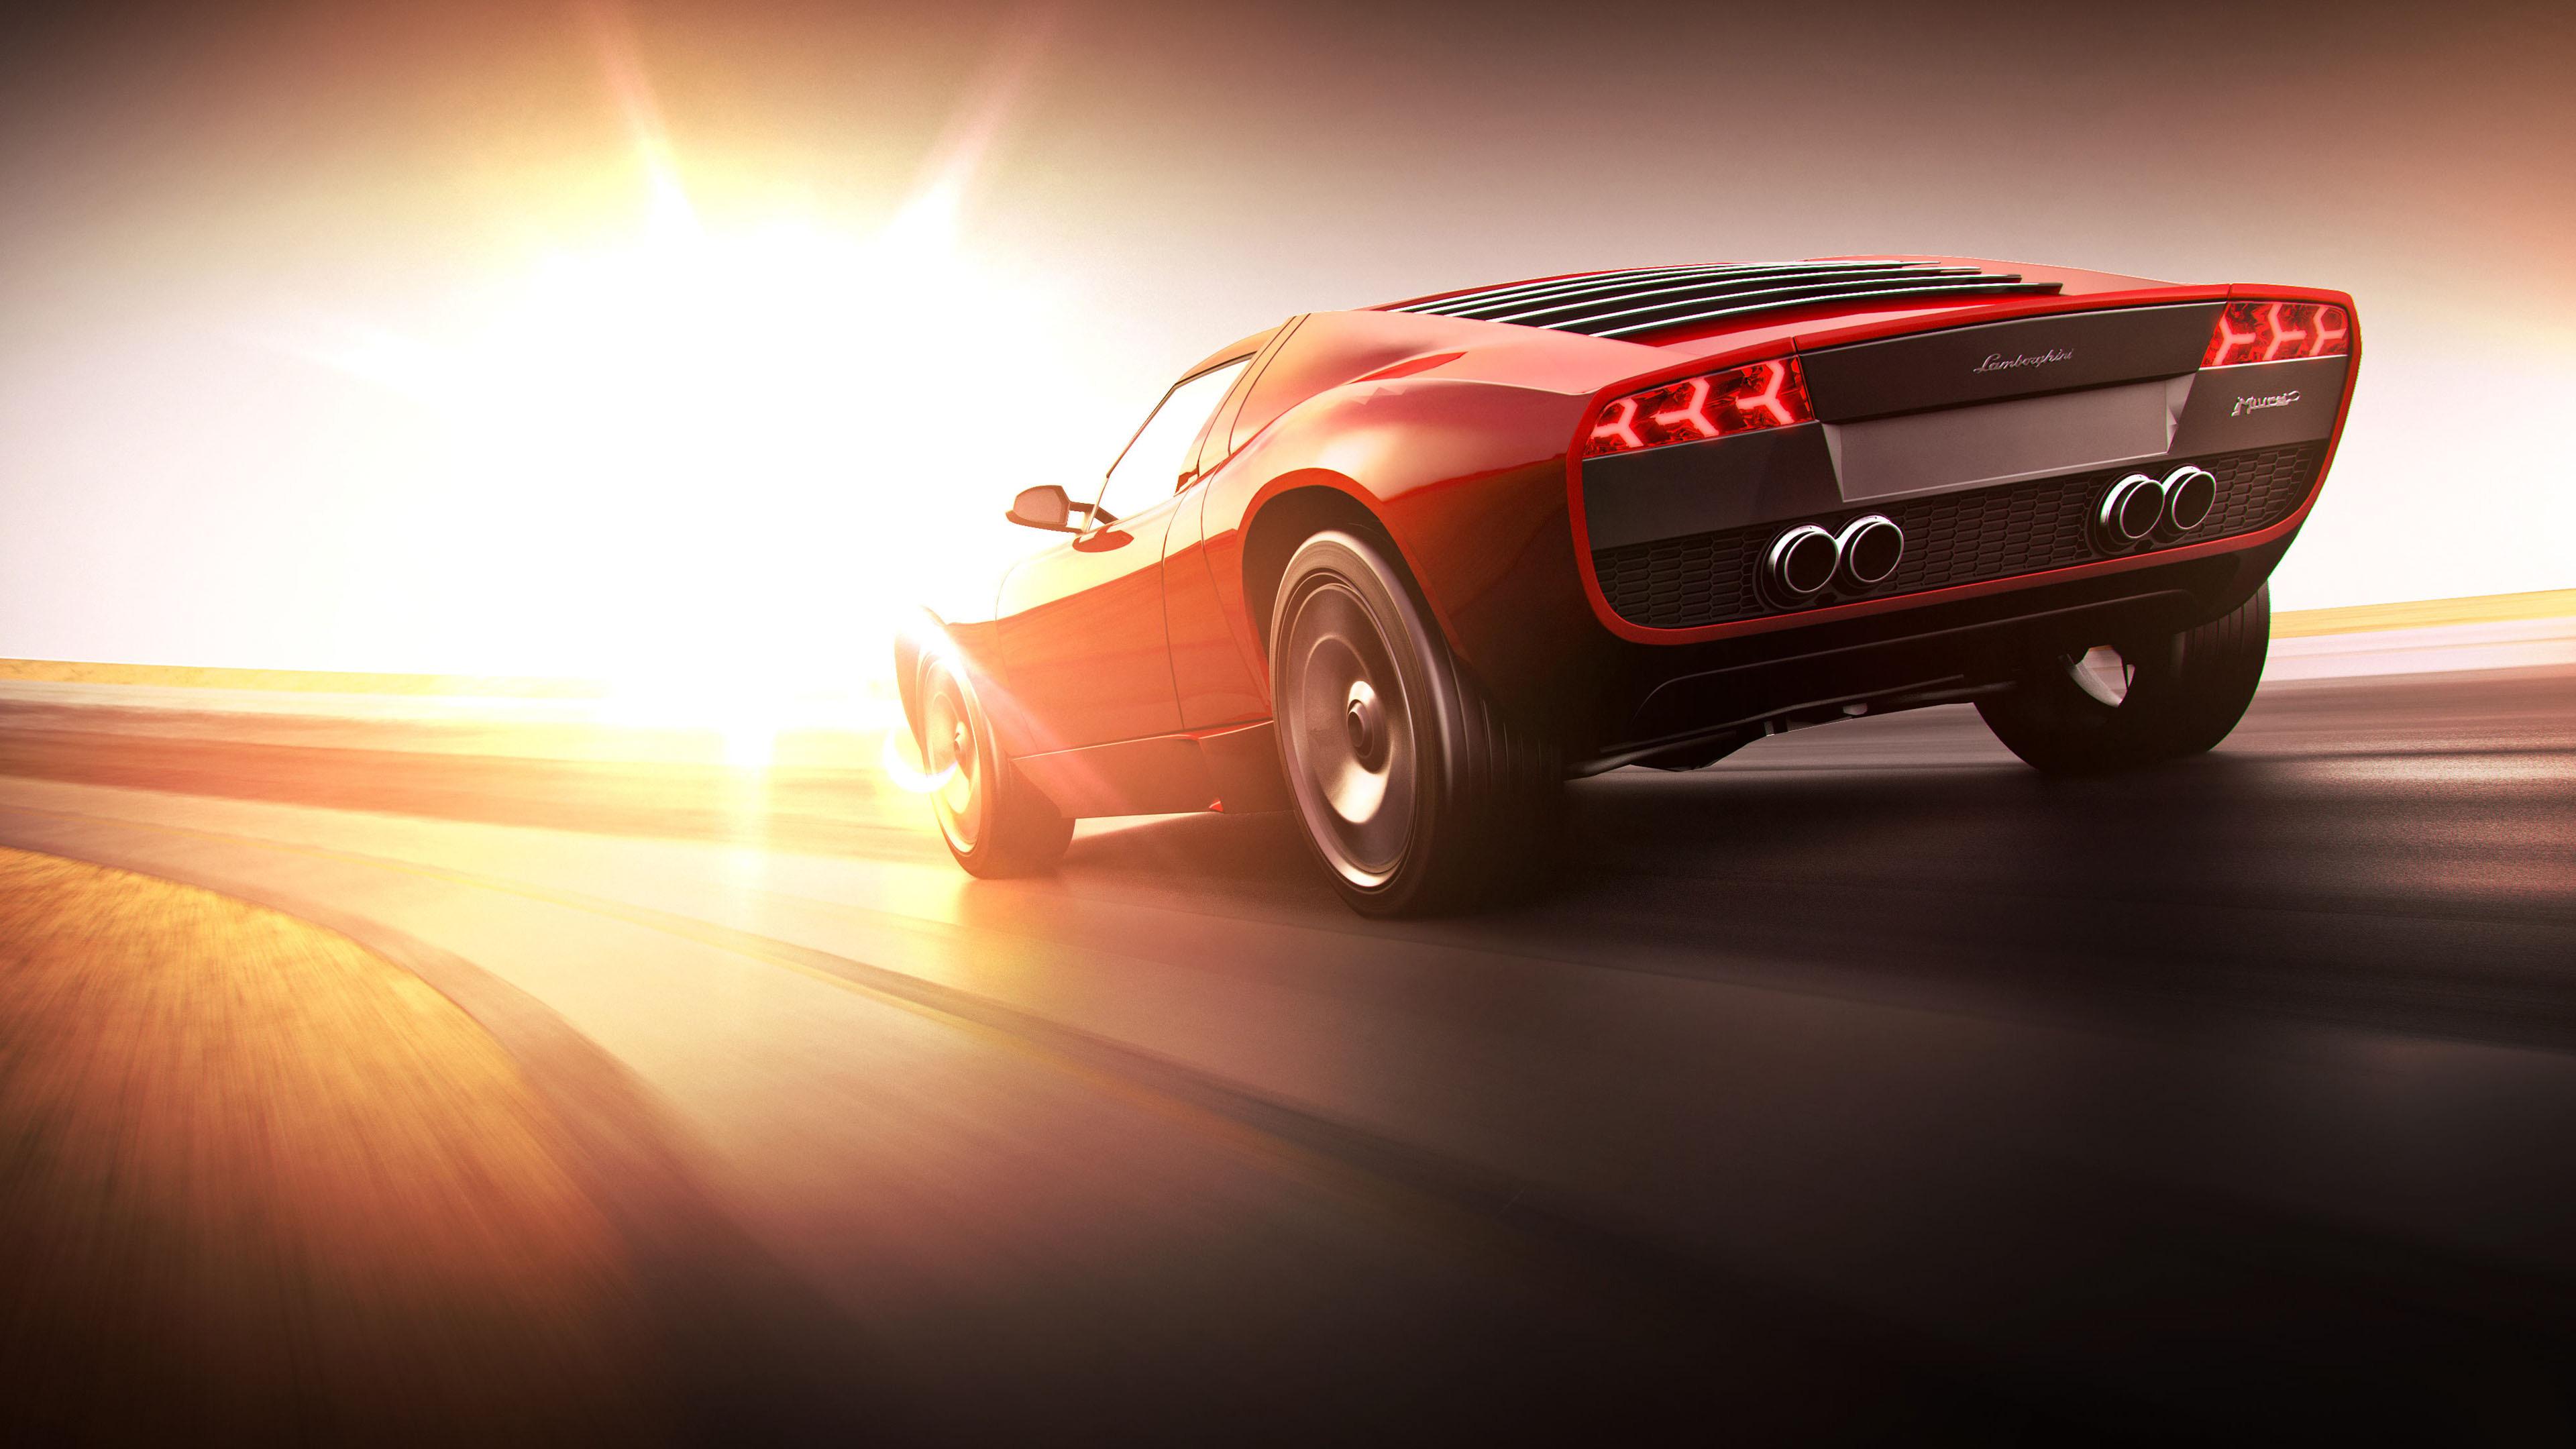 red lamborghini 4k 1539113661 - Red Lamborghini 4k - lamborghini wallpapers, hd-wallpapers, digital art wallpapers, cgi wallpapers, cars wallpapers, artwork wallpapers, artist wallpapers, 4k-wallpapers